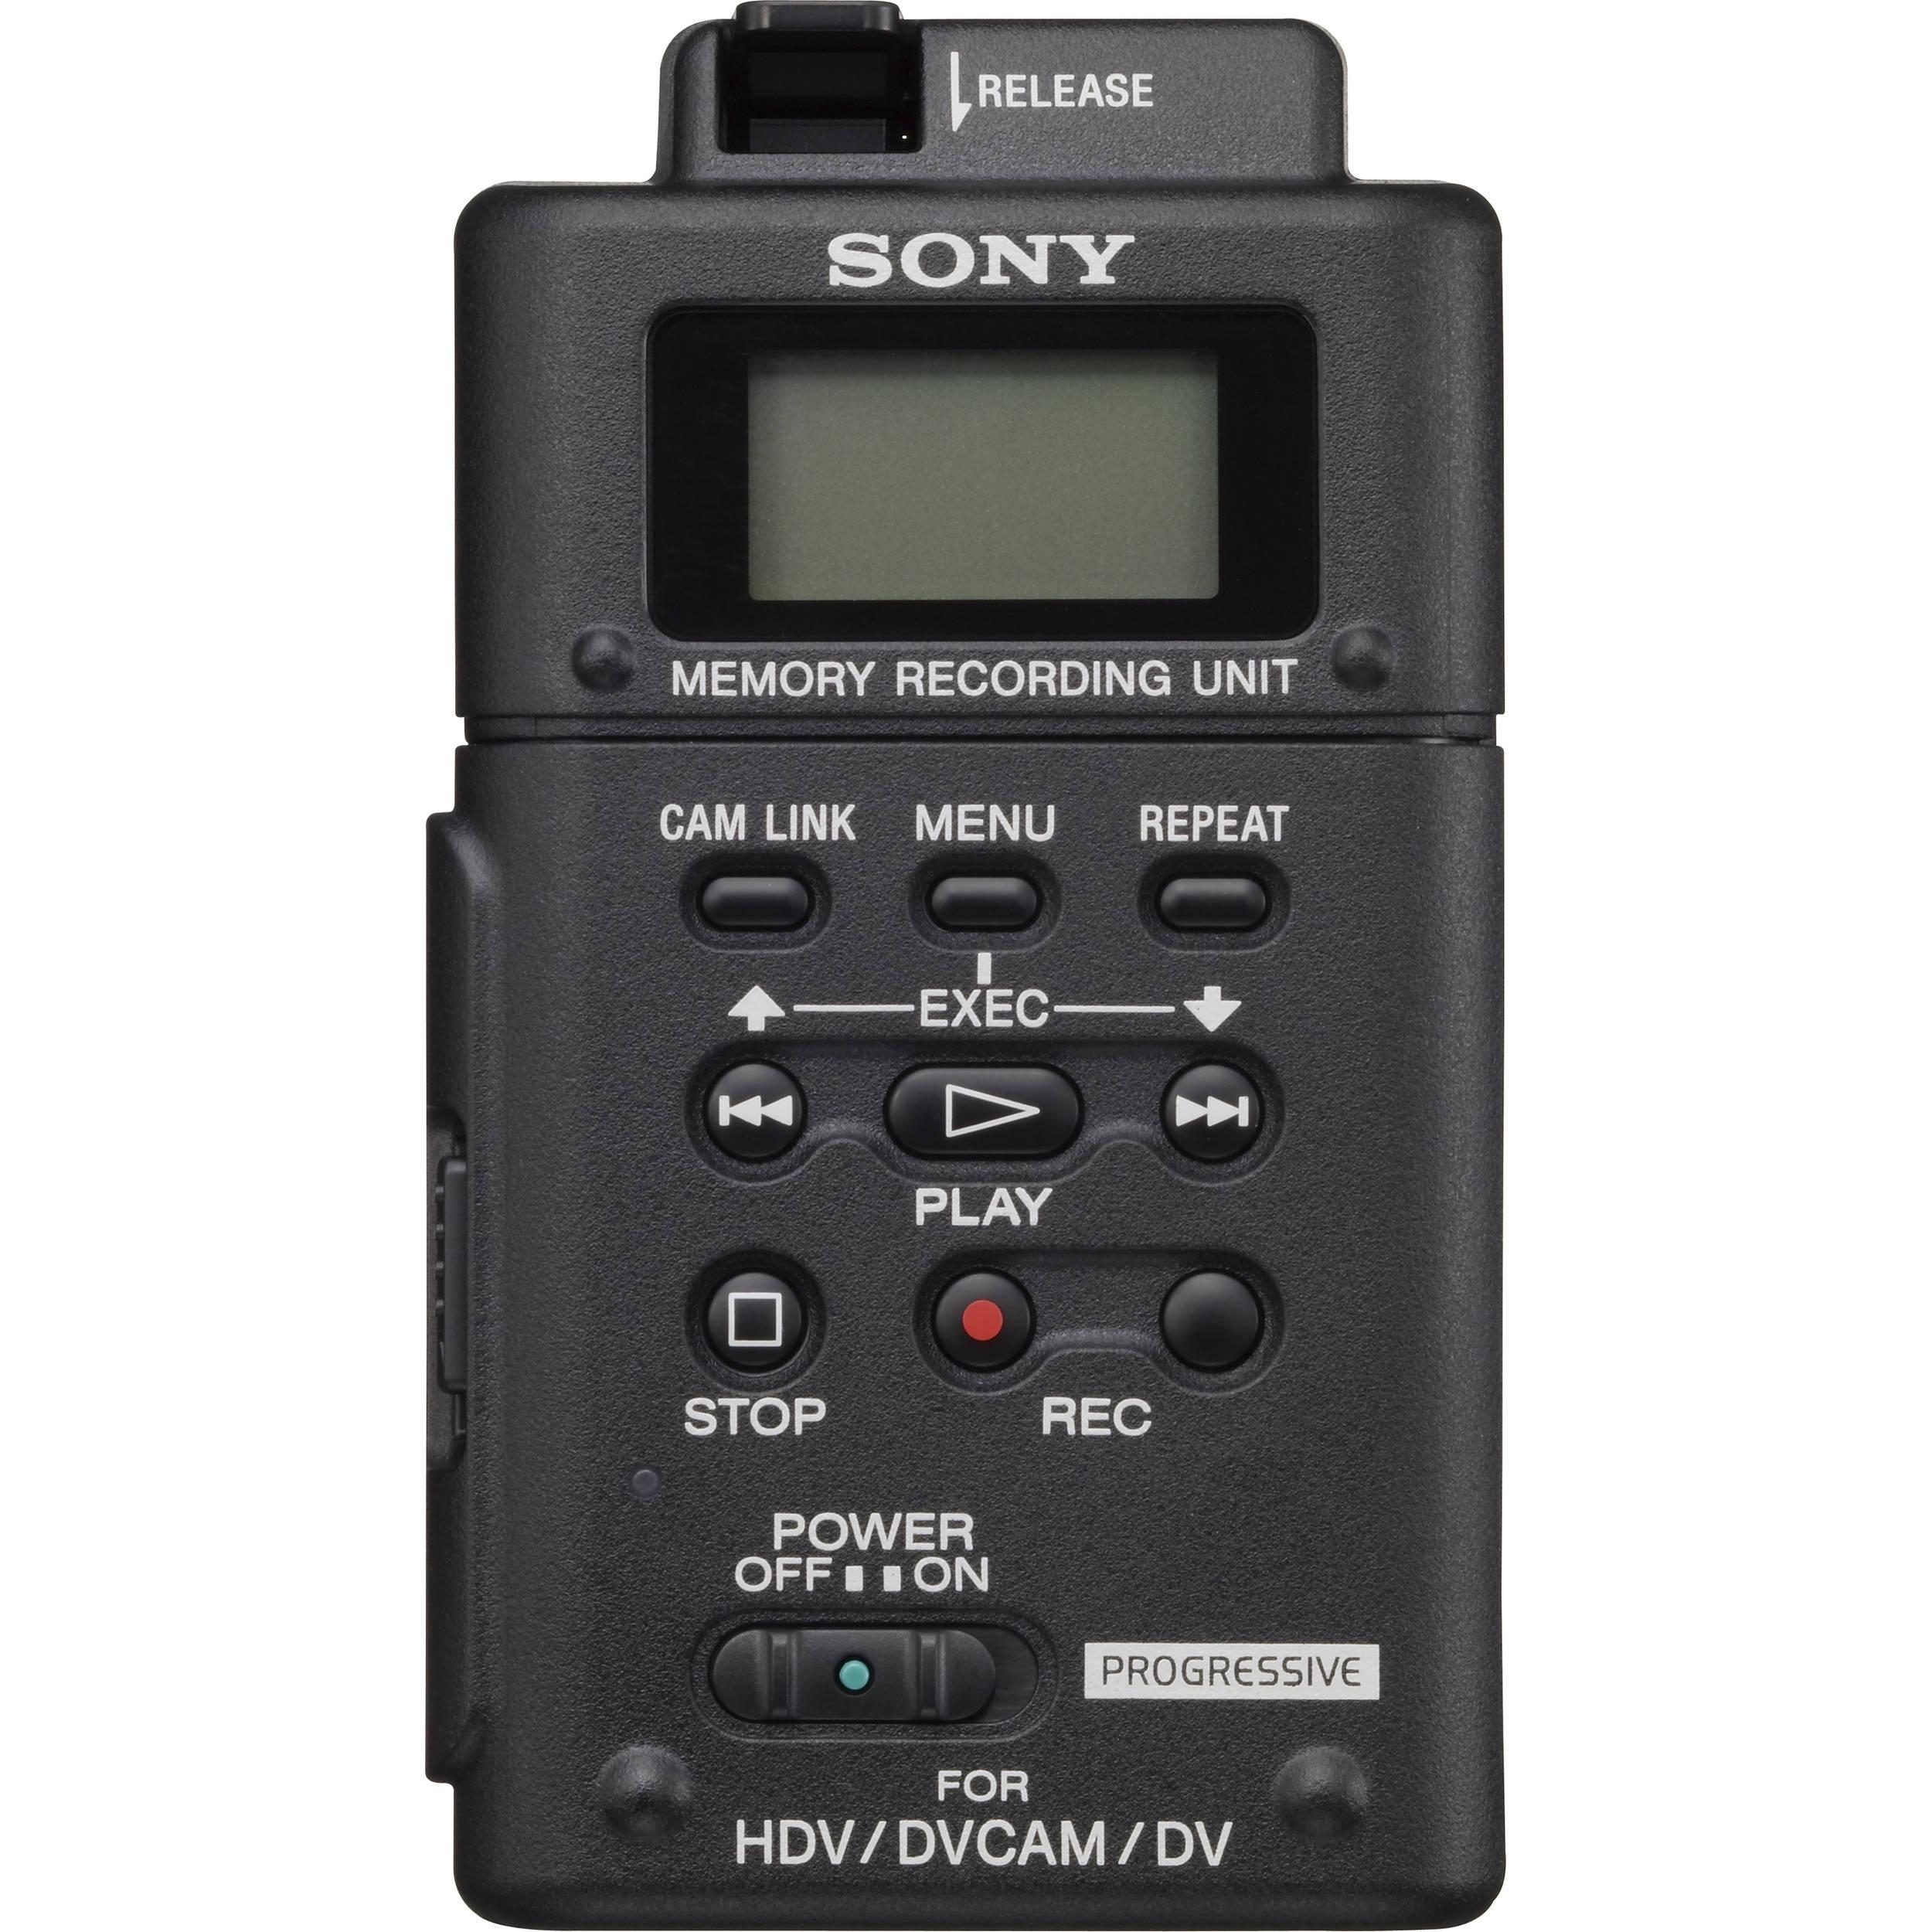 Sony Recording Sony Hvr-mrc1 Memory Recording